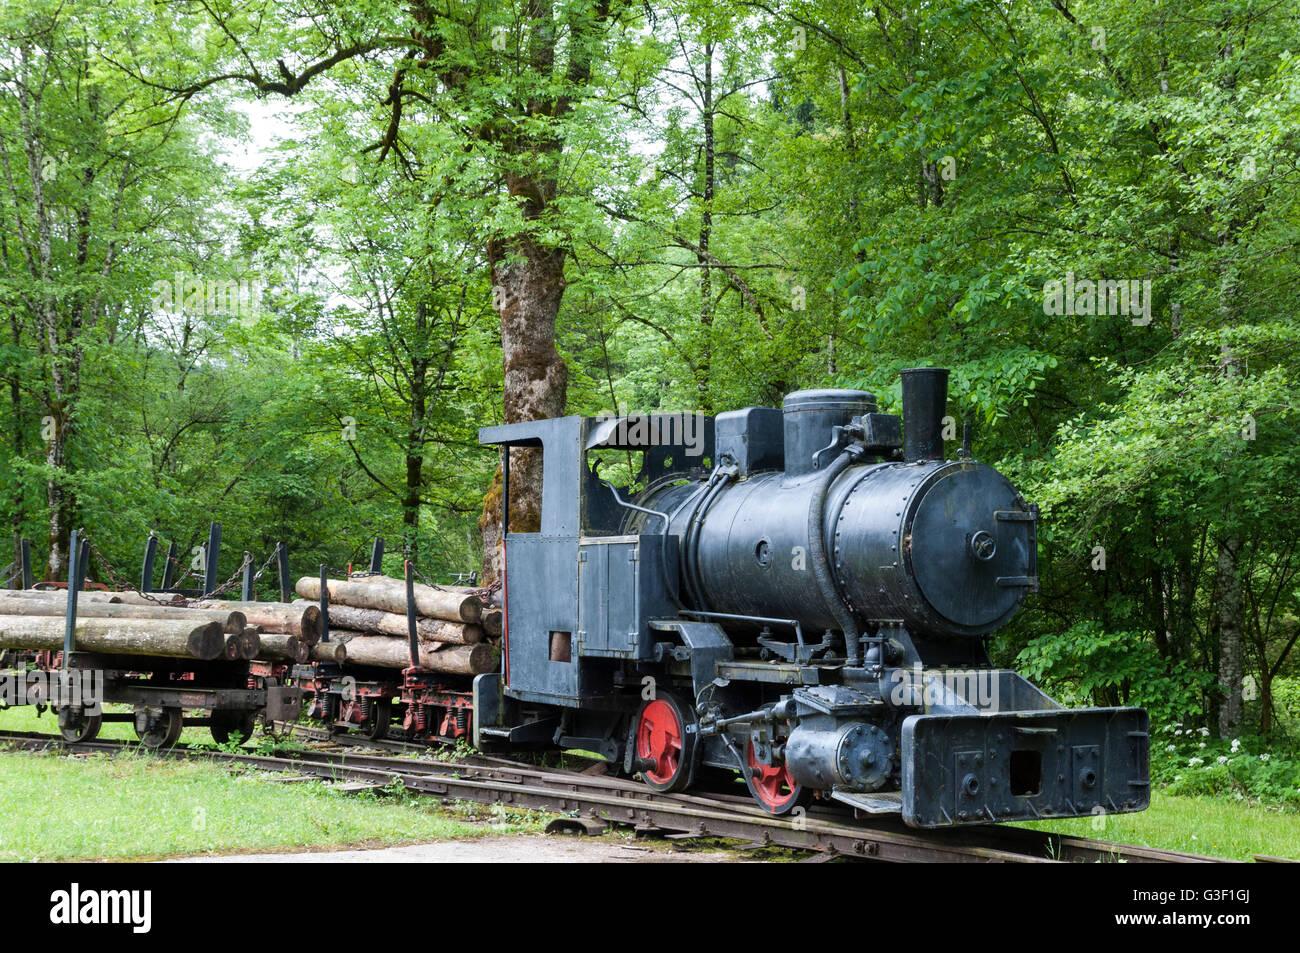 Locomotive, former forest railway, Hintergebirgs cycle track, Kalkalpen National Park, Upper Austria, Austria - Stock Image